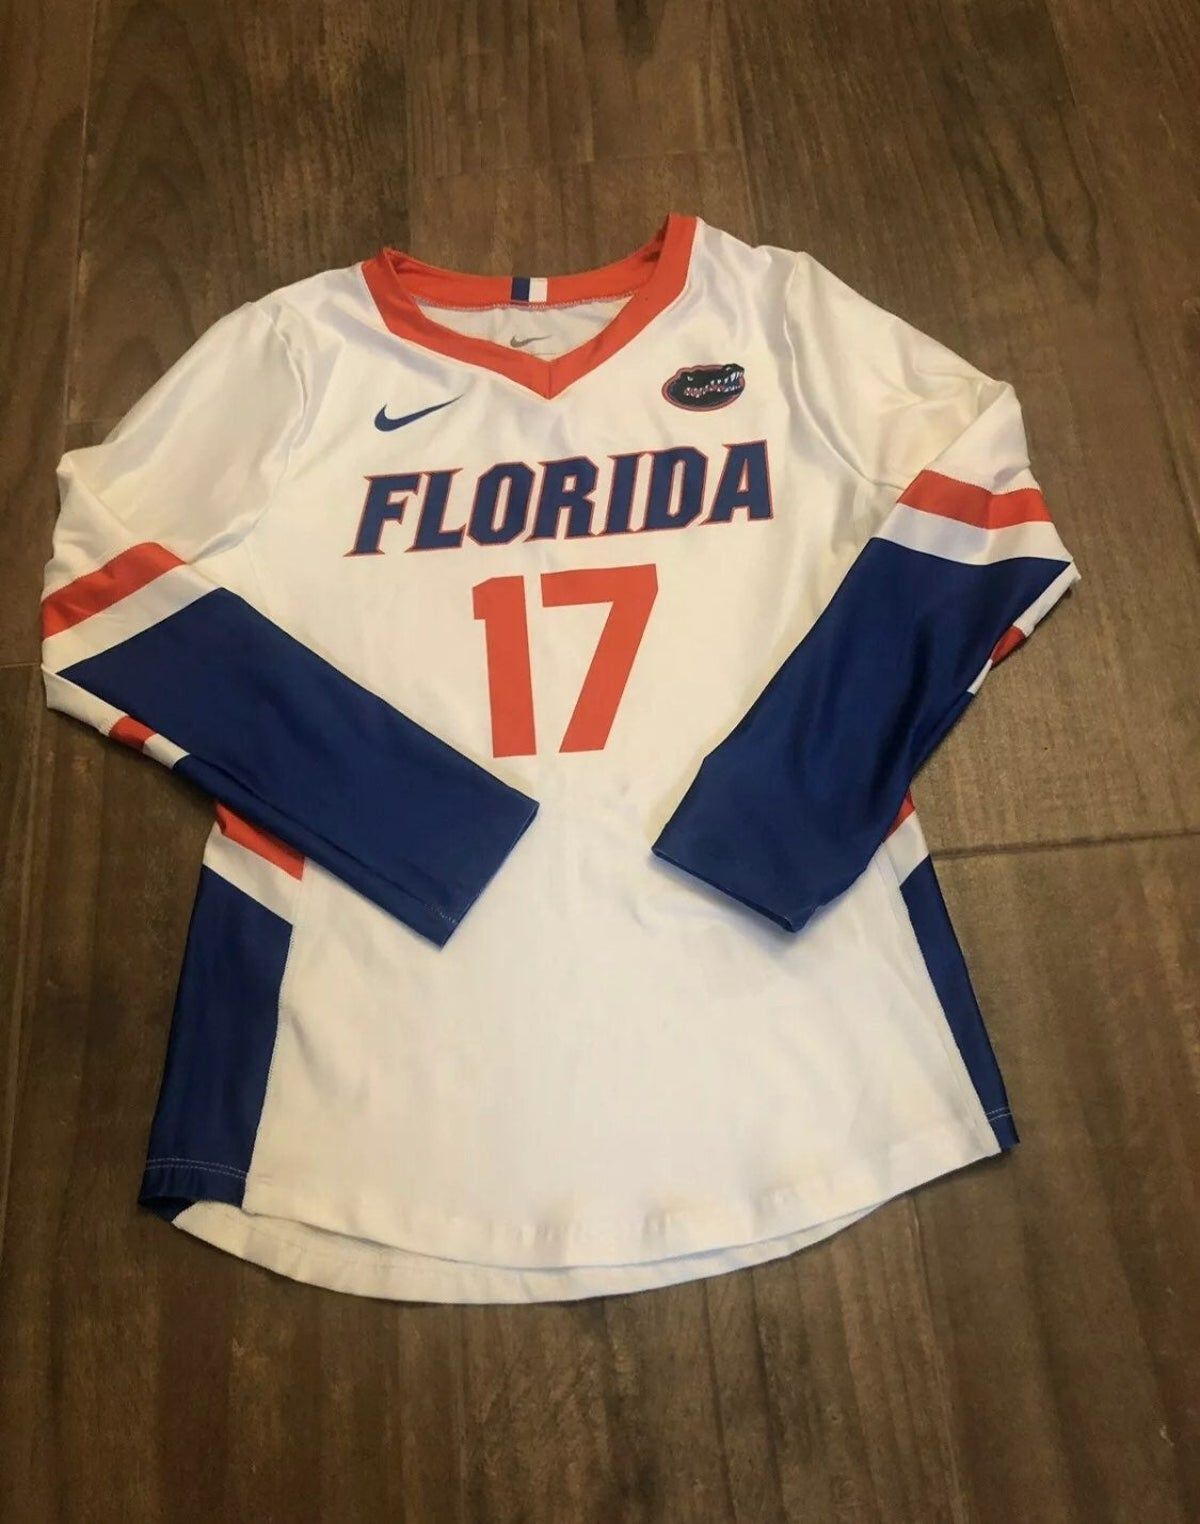 Florida Gators Volleyball Jersey Girls M In 2020 Volleyball Jerseys Jersey Design Jersey